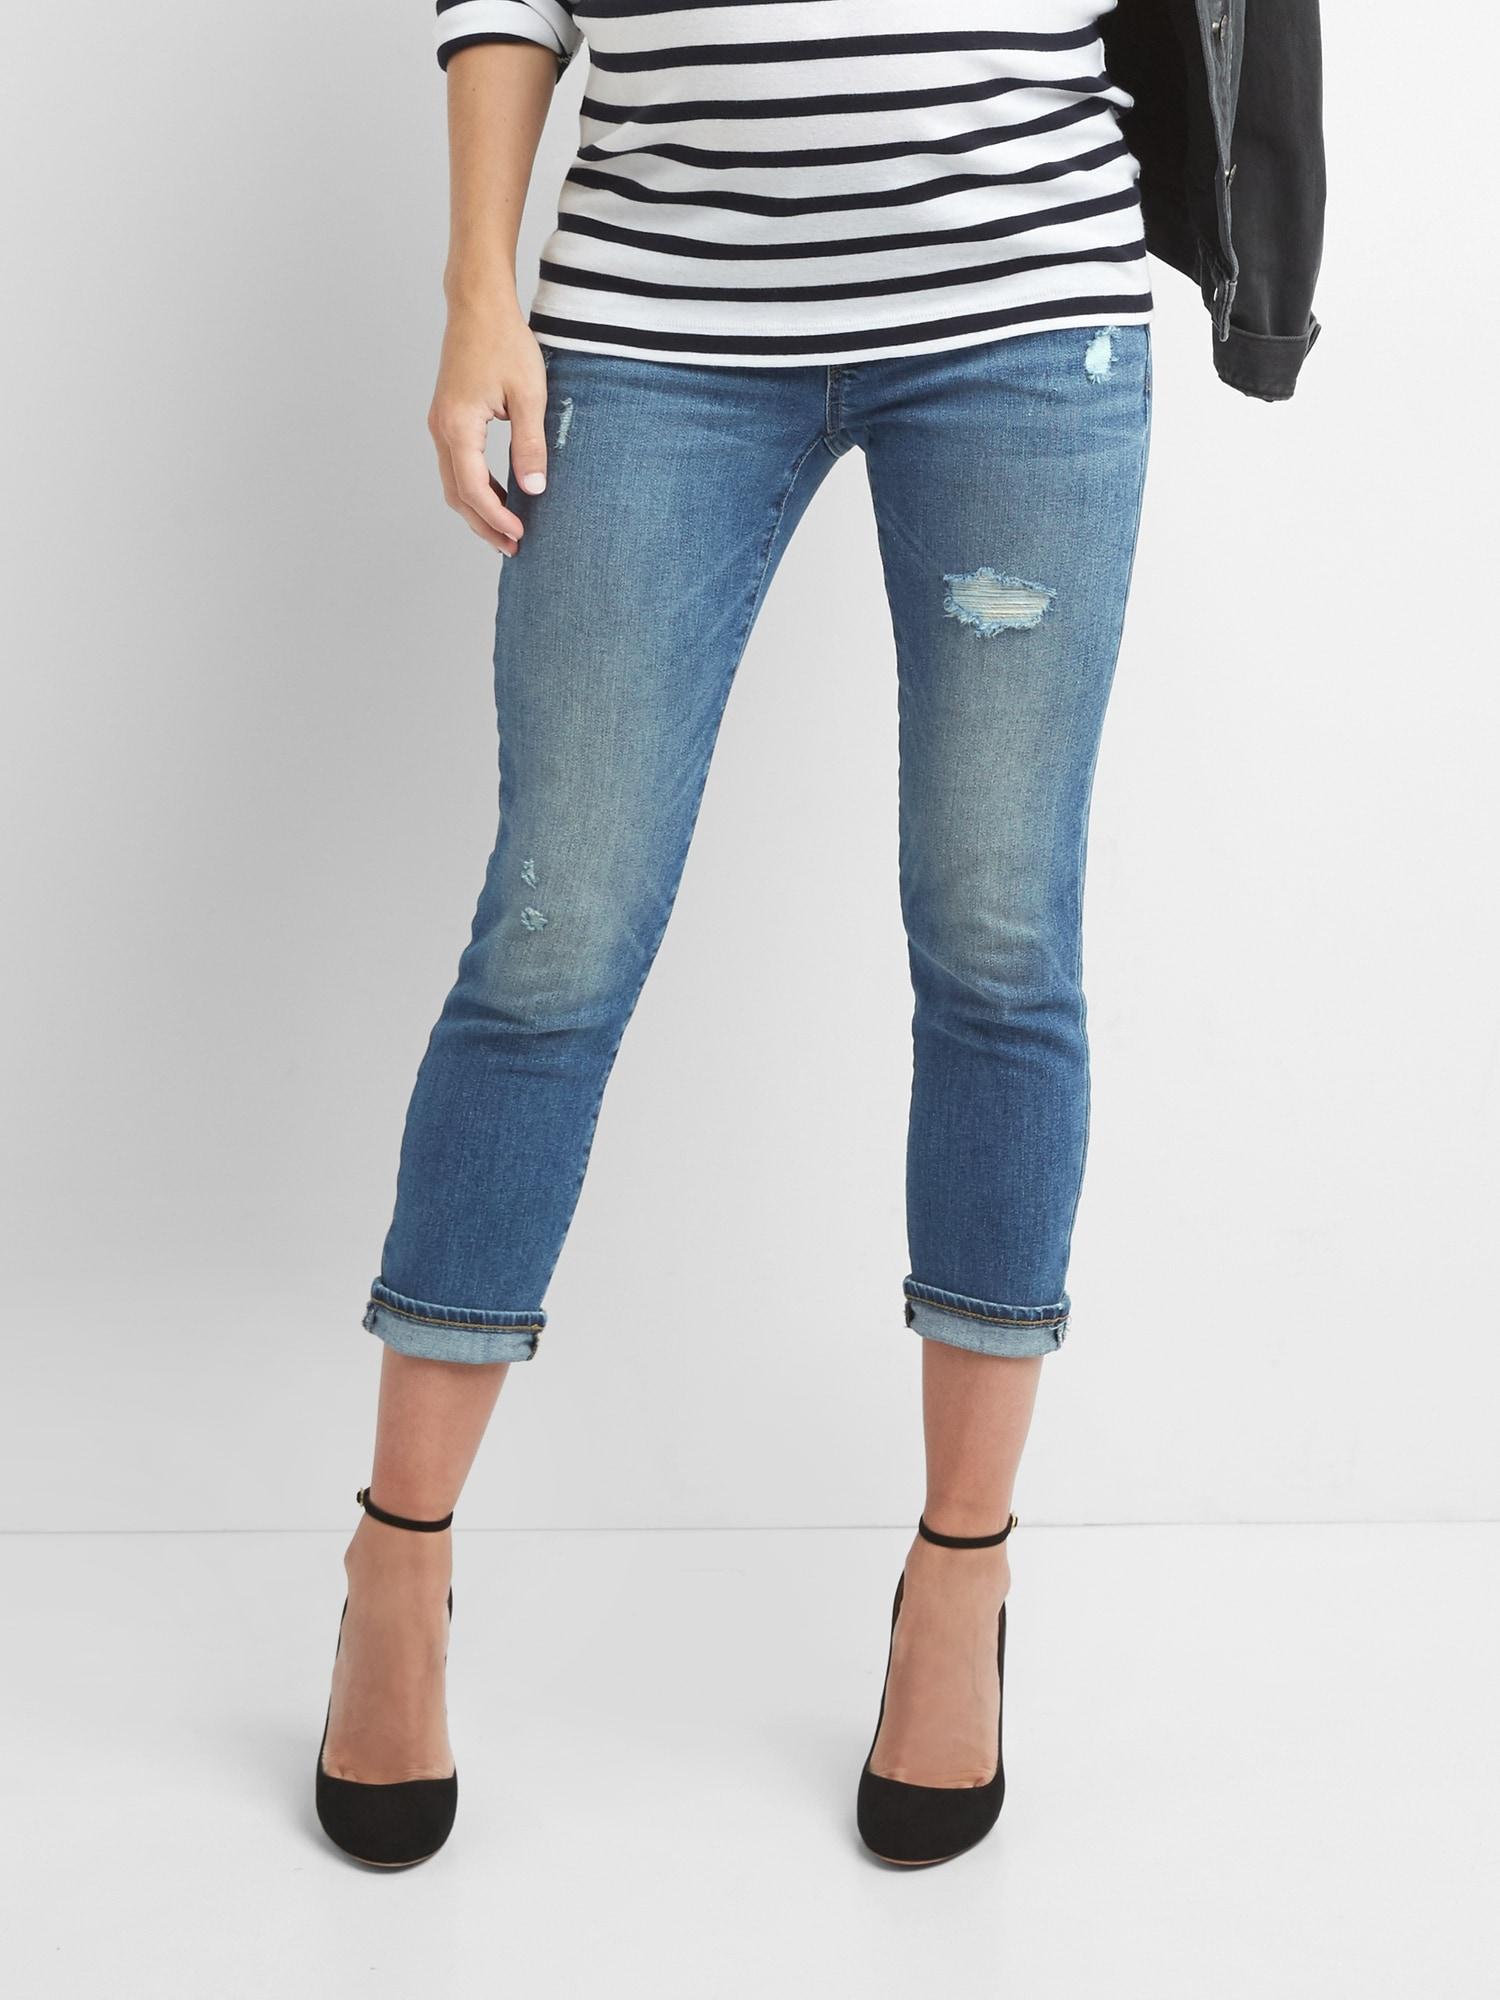 d021404b05bd4 Gap Maternity Demi Panel Distressed Best Girlfriend Jeans in Blue - Lyst